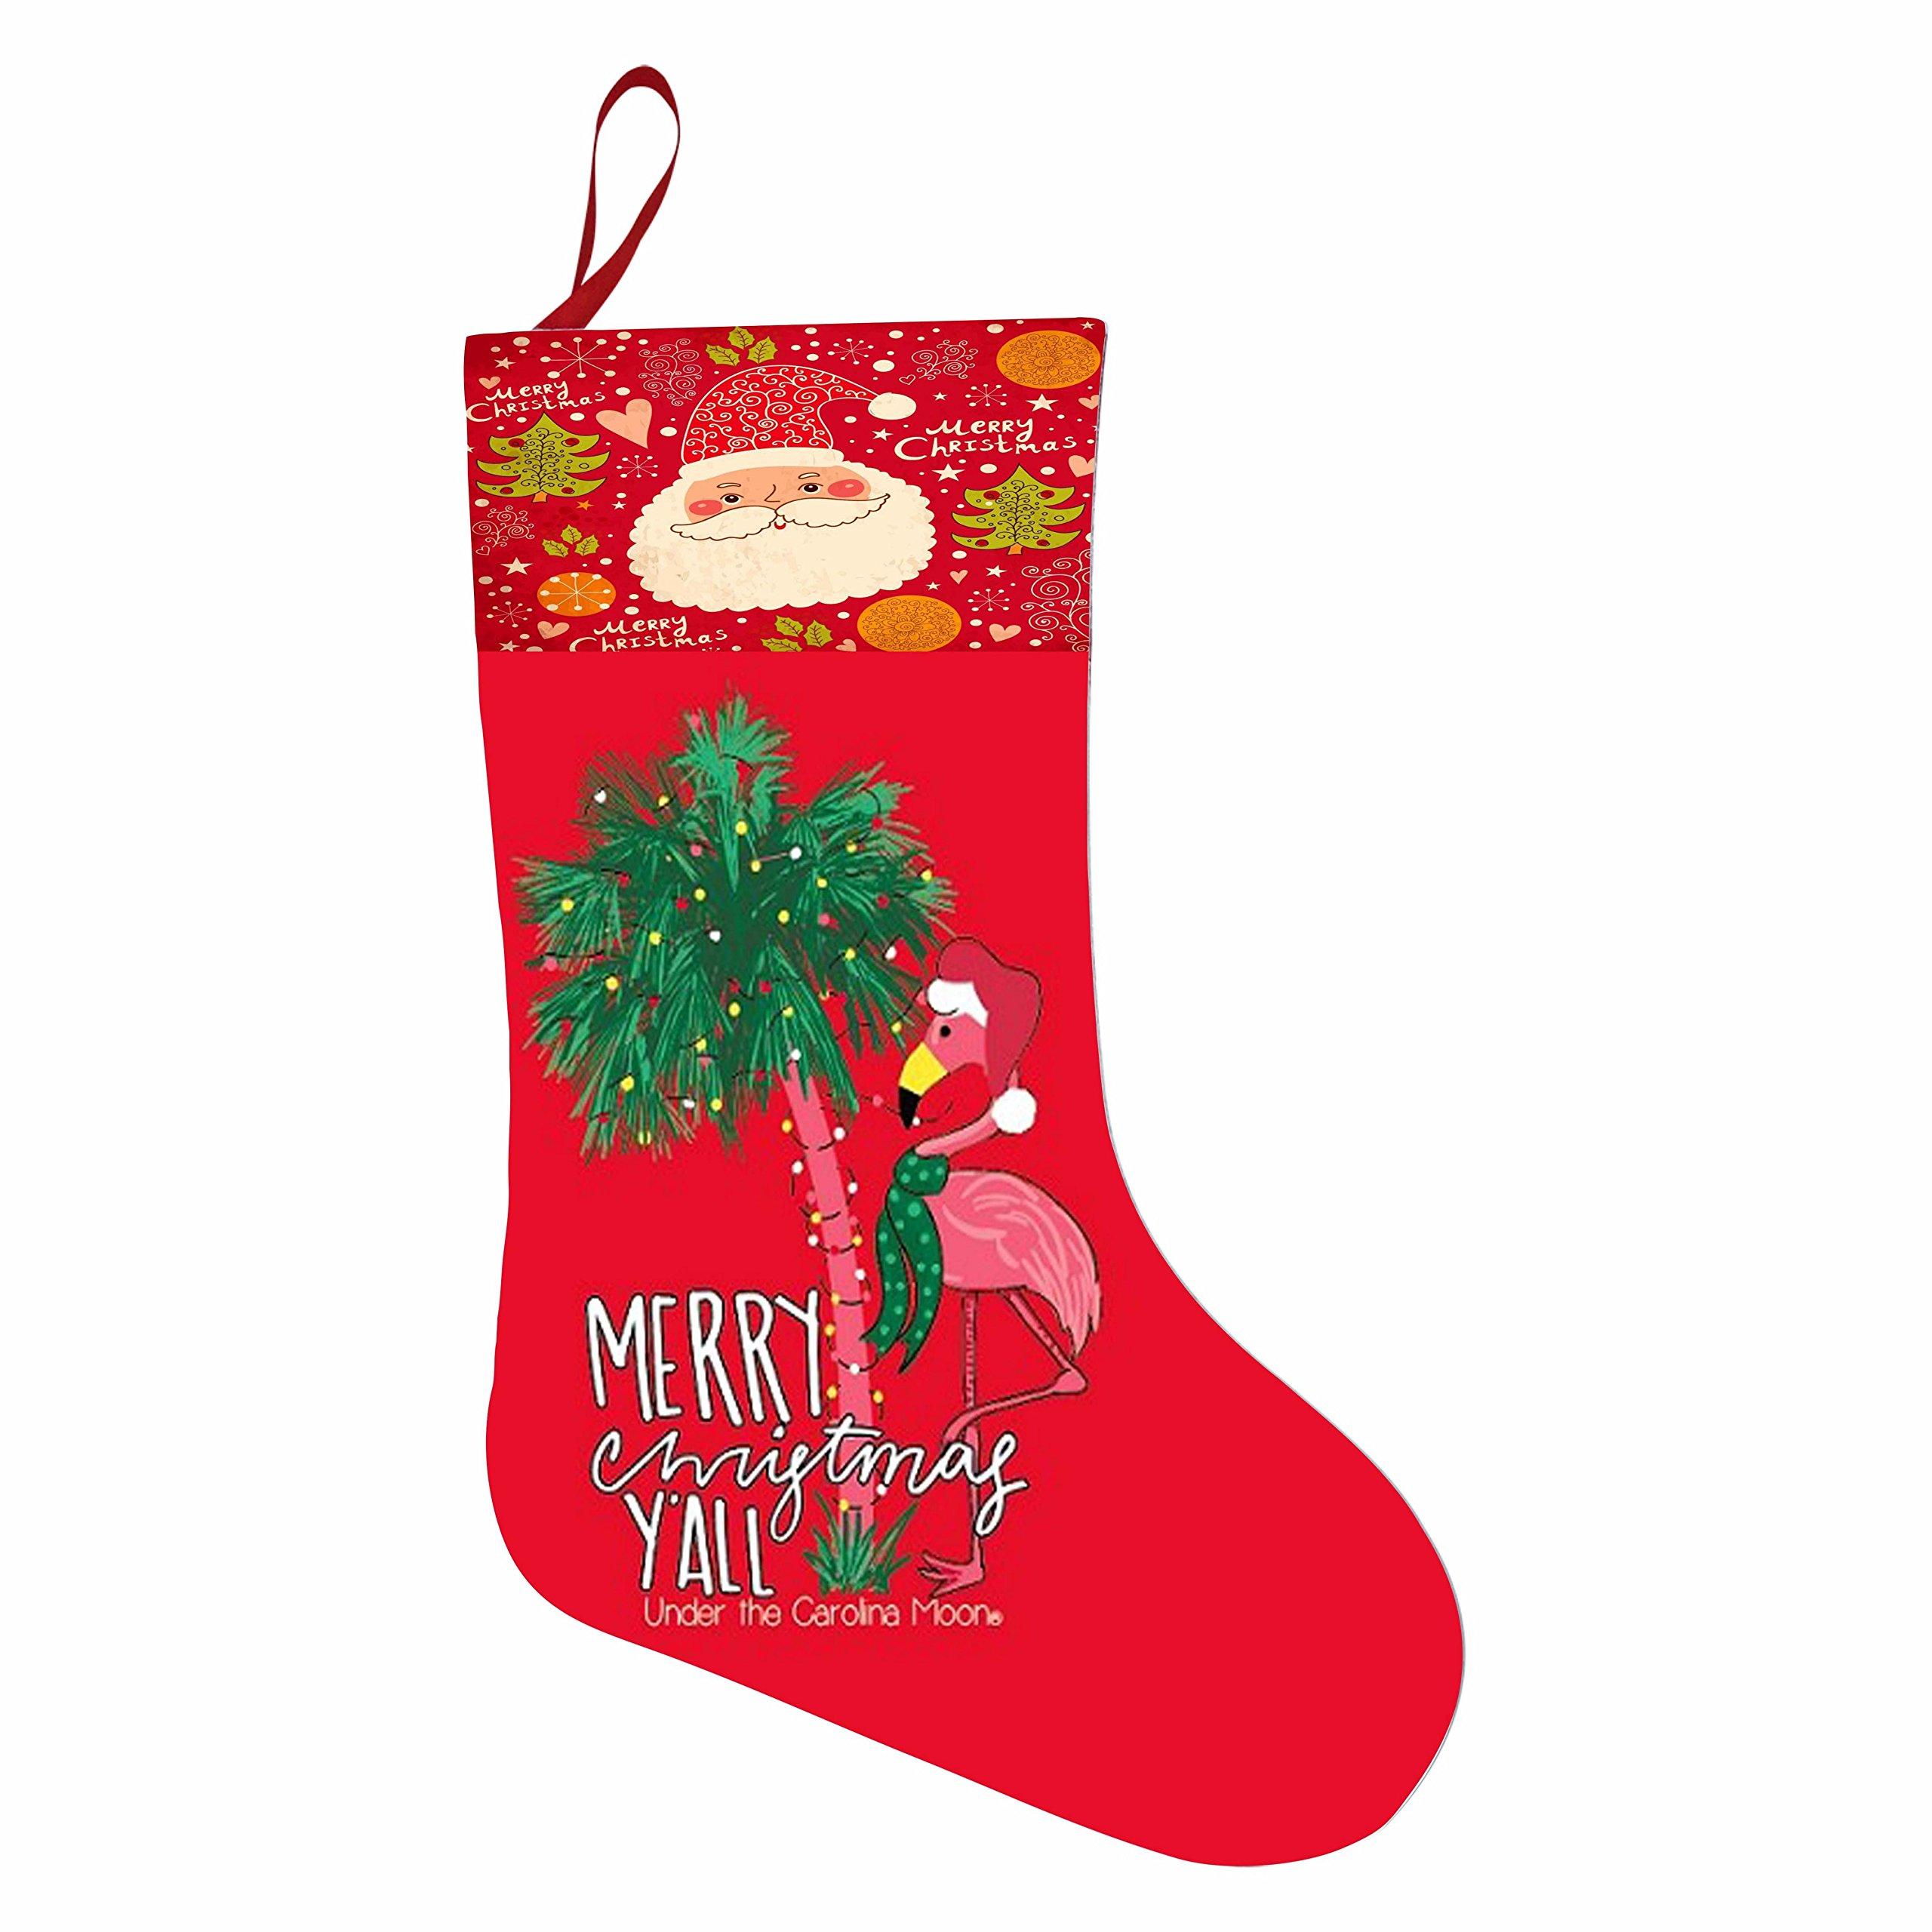 Cartoon Flamingo Merry Christmas Holiday Stocking 3D Printed Santa Claus Sock Xmas Partyies Decorate New Year Gift